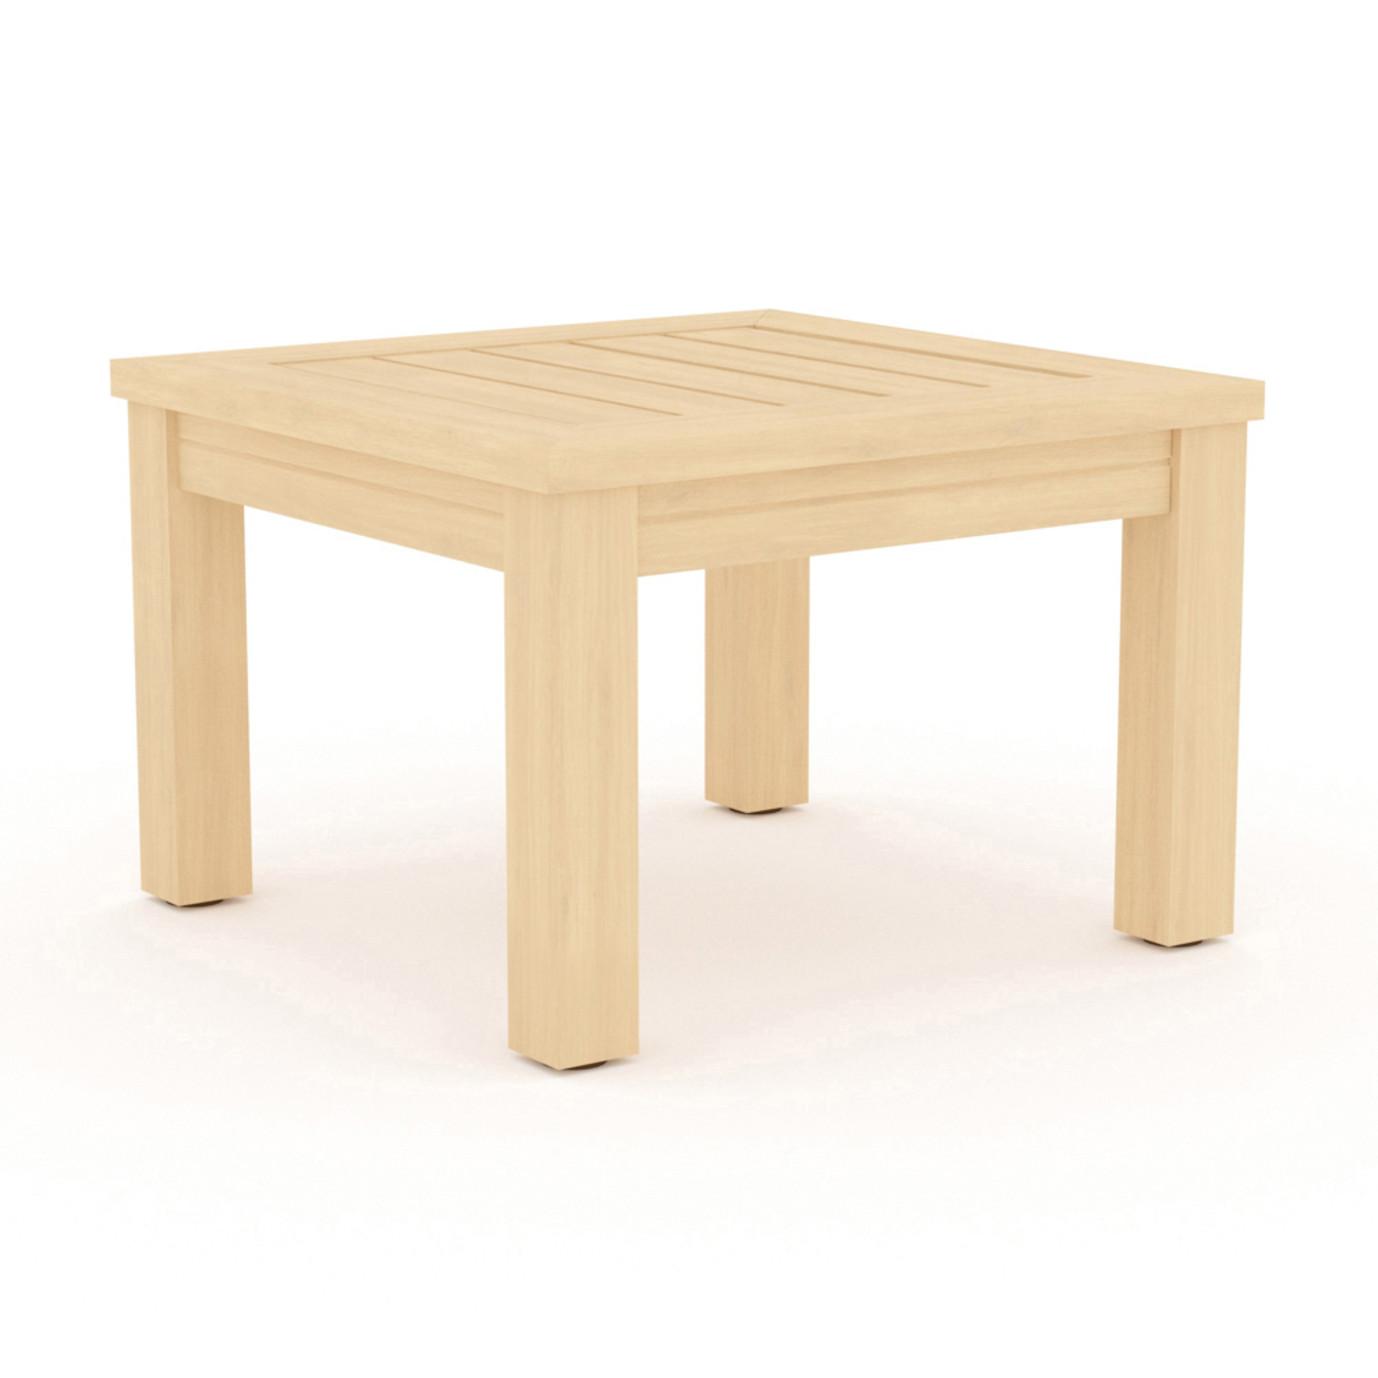 Benson 8pc Sofa & Club Chair Set - Navy Blue